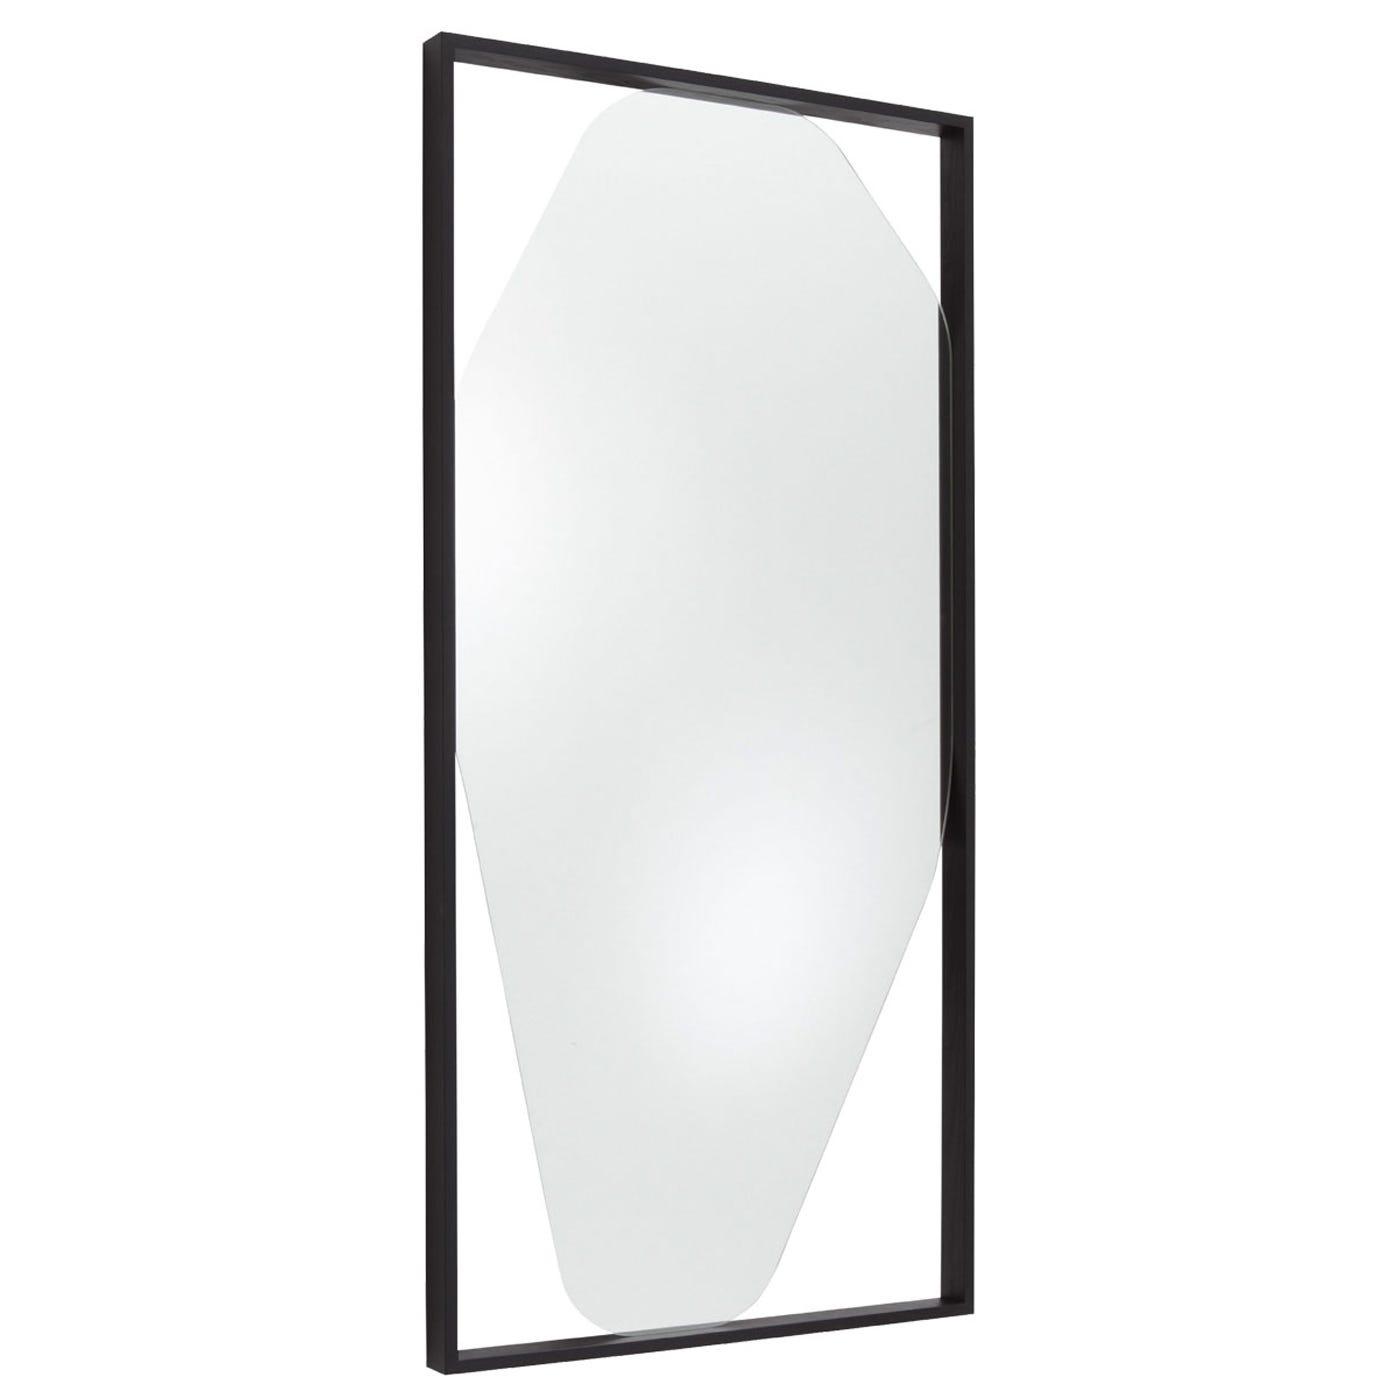 Belize mirror